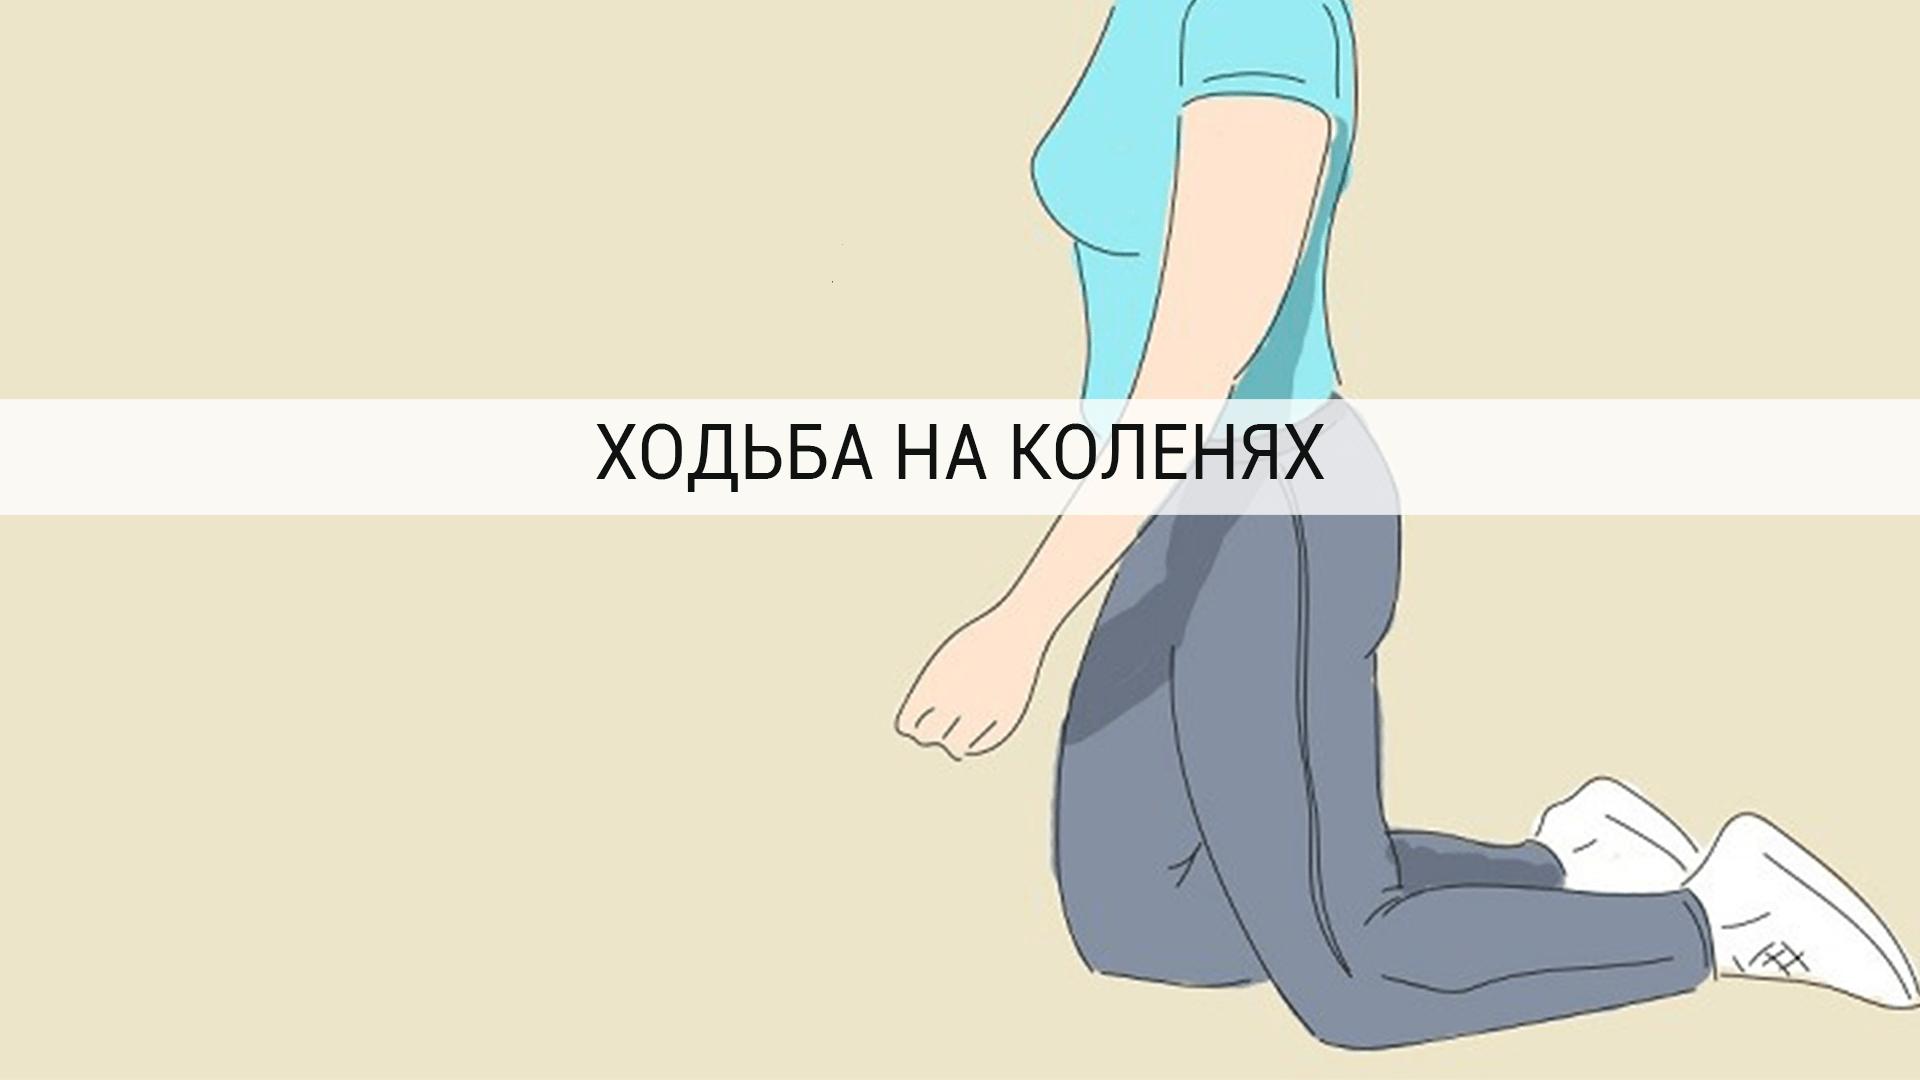 hodba-na-kolenyah